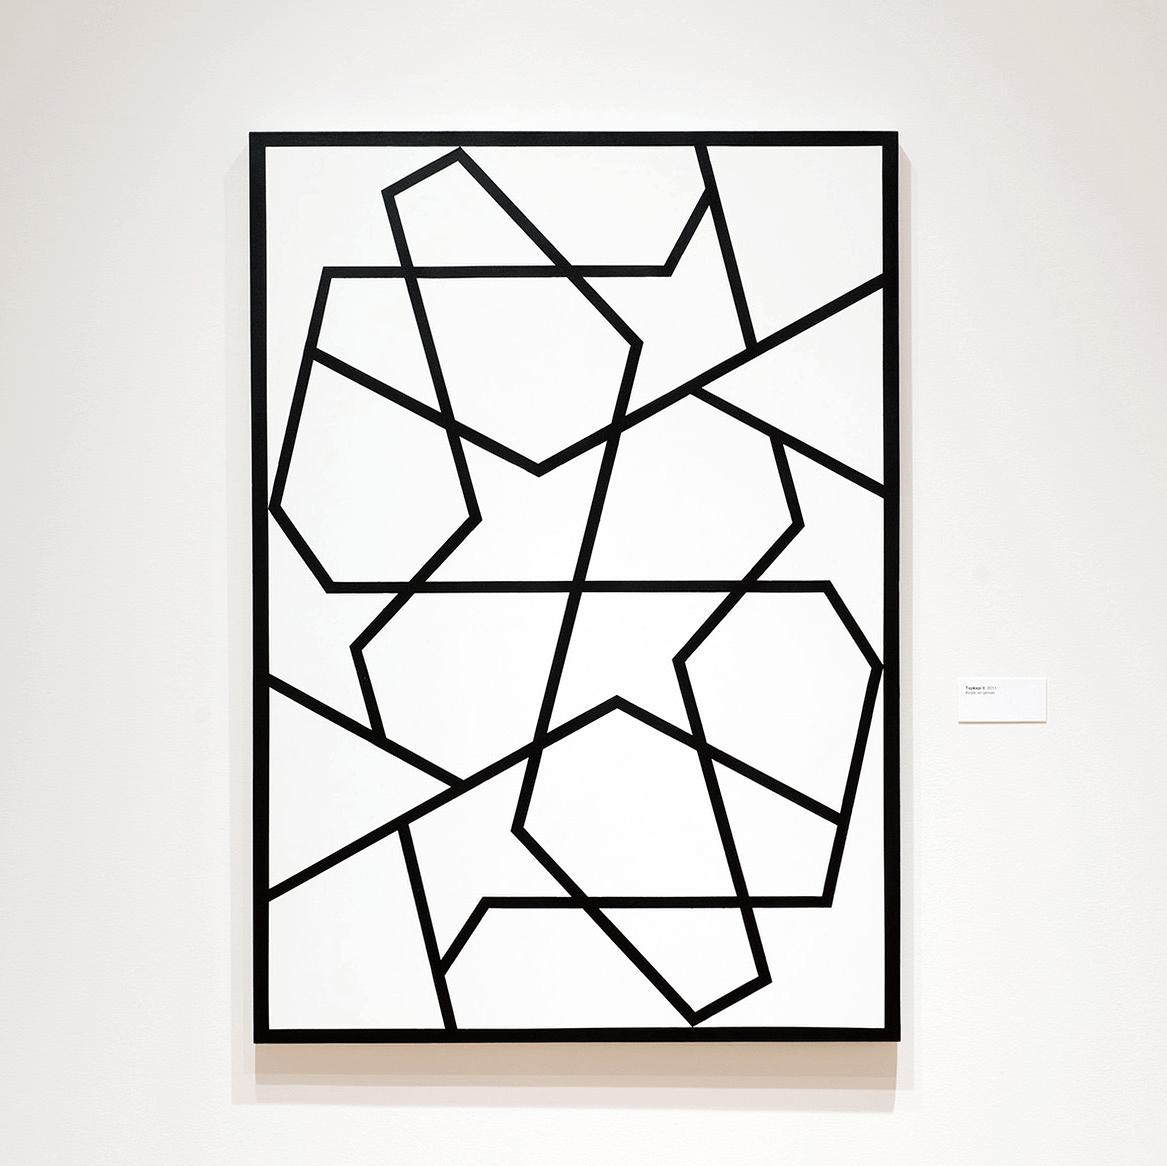 Topkapi XII   2012. Acrylic on canvas. 60 x 43 in., 152.4 x 109.2 cm.